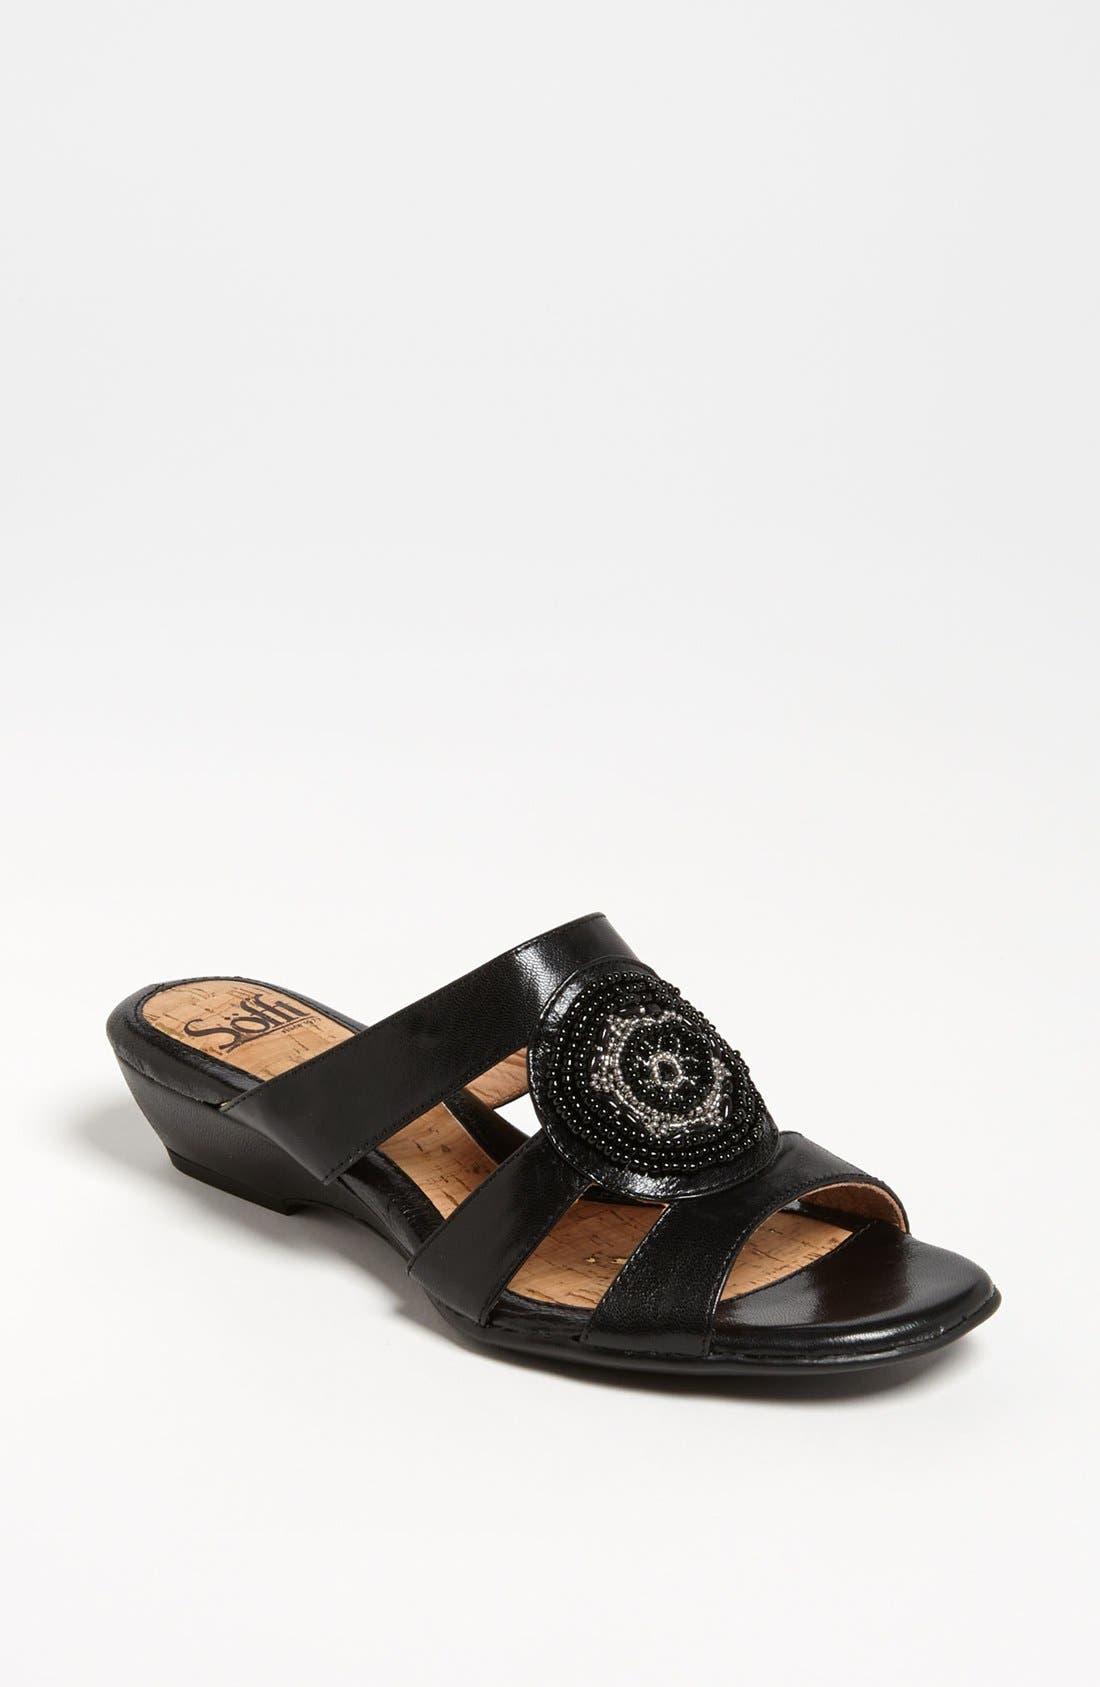 Alternate Image 1 Selected - Söfft 'Radella' Sandal